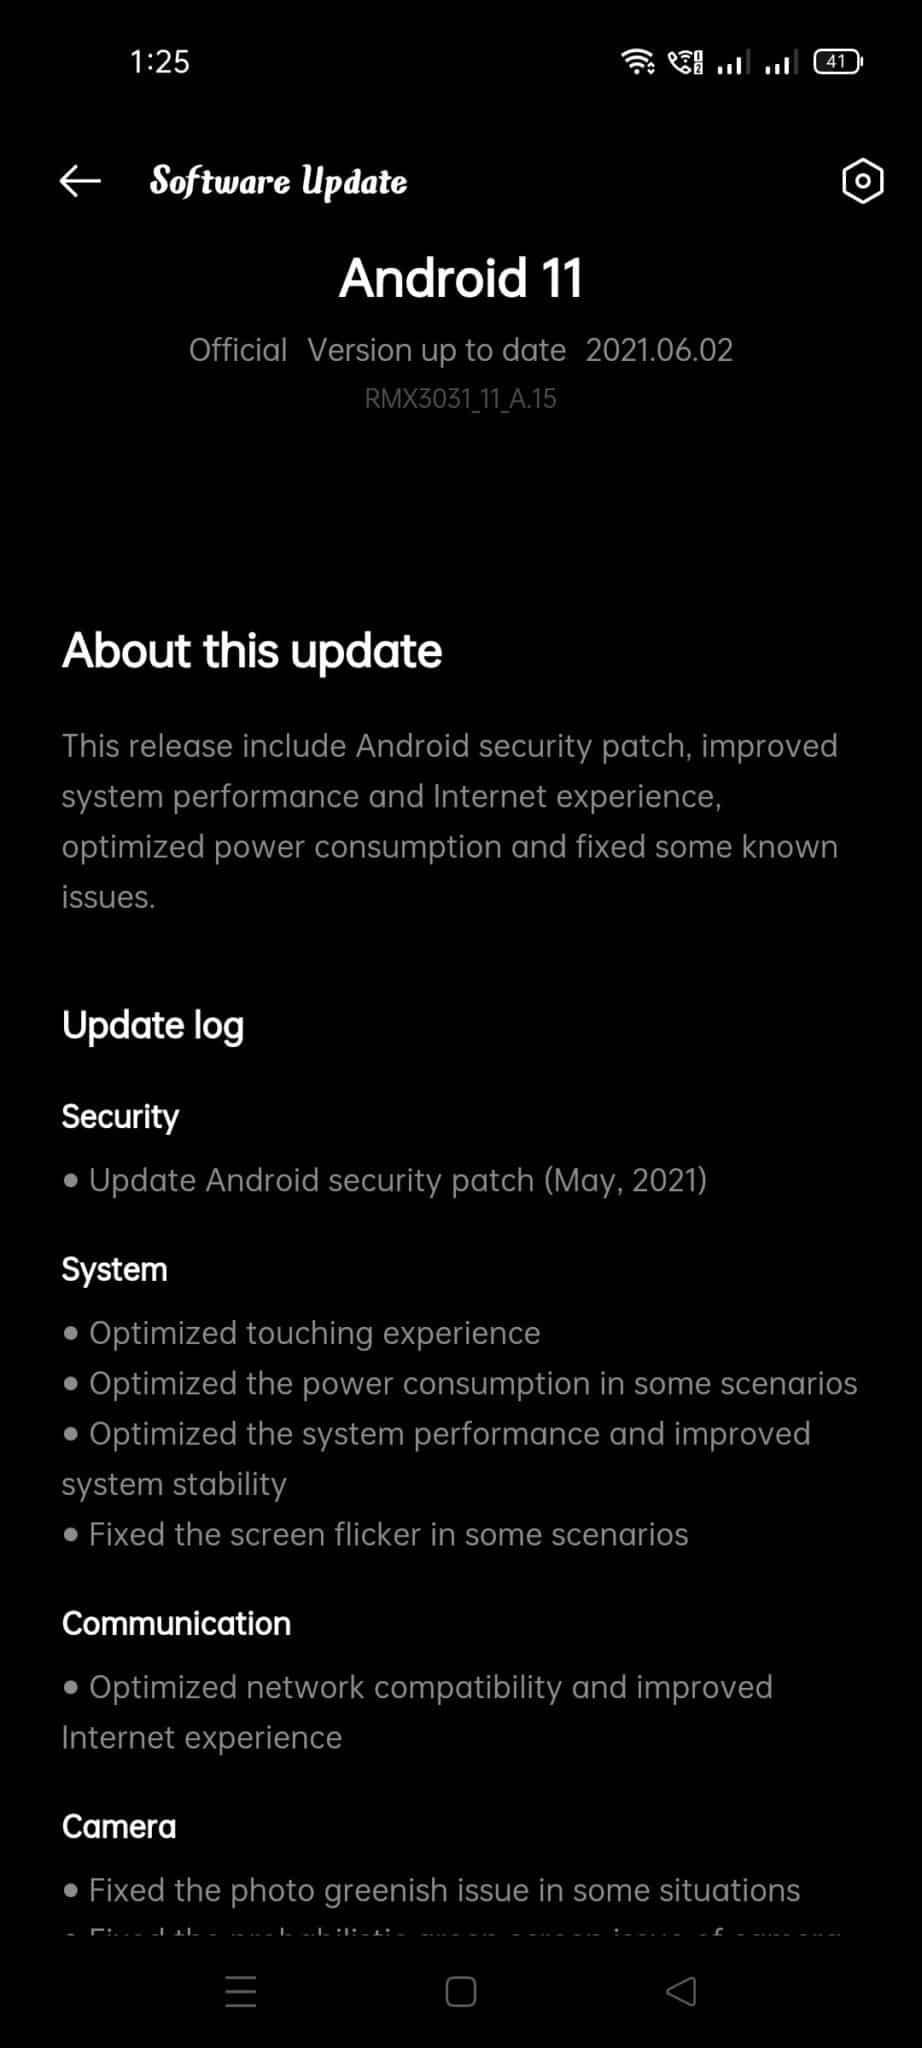 Realme X7 Max 5G RMX3031_11_A.15 update changelog